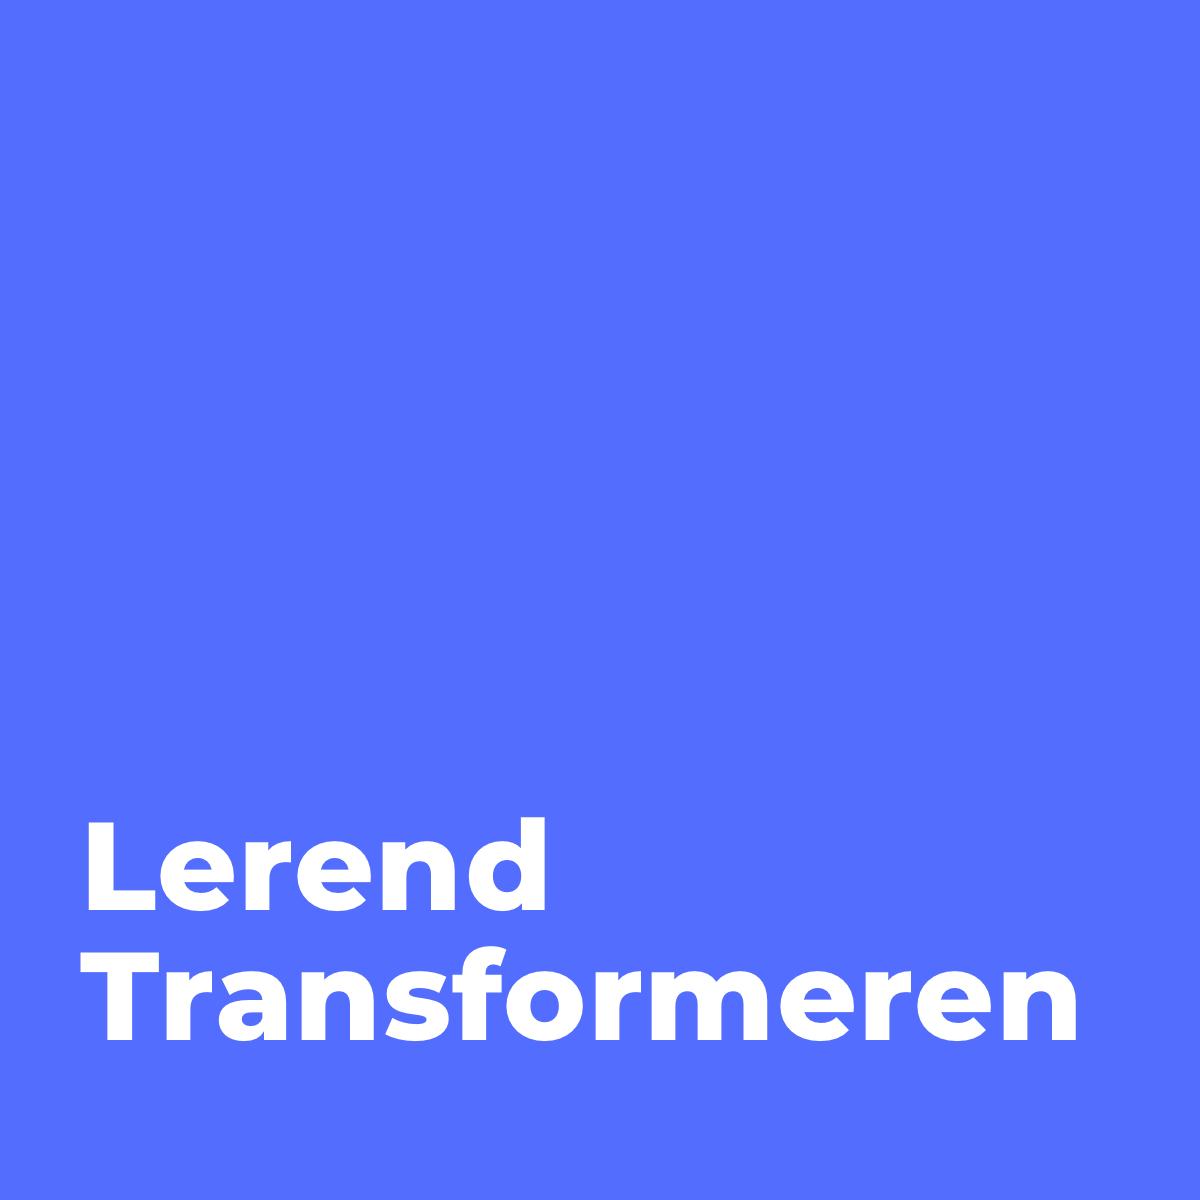 TNO-lerendtransformeren-case04c – lerend transformeren